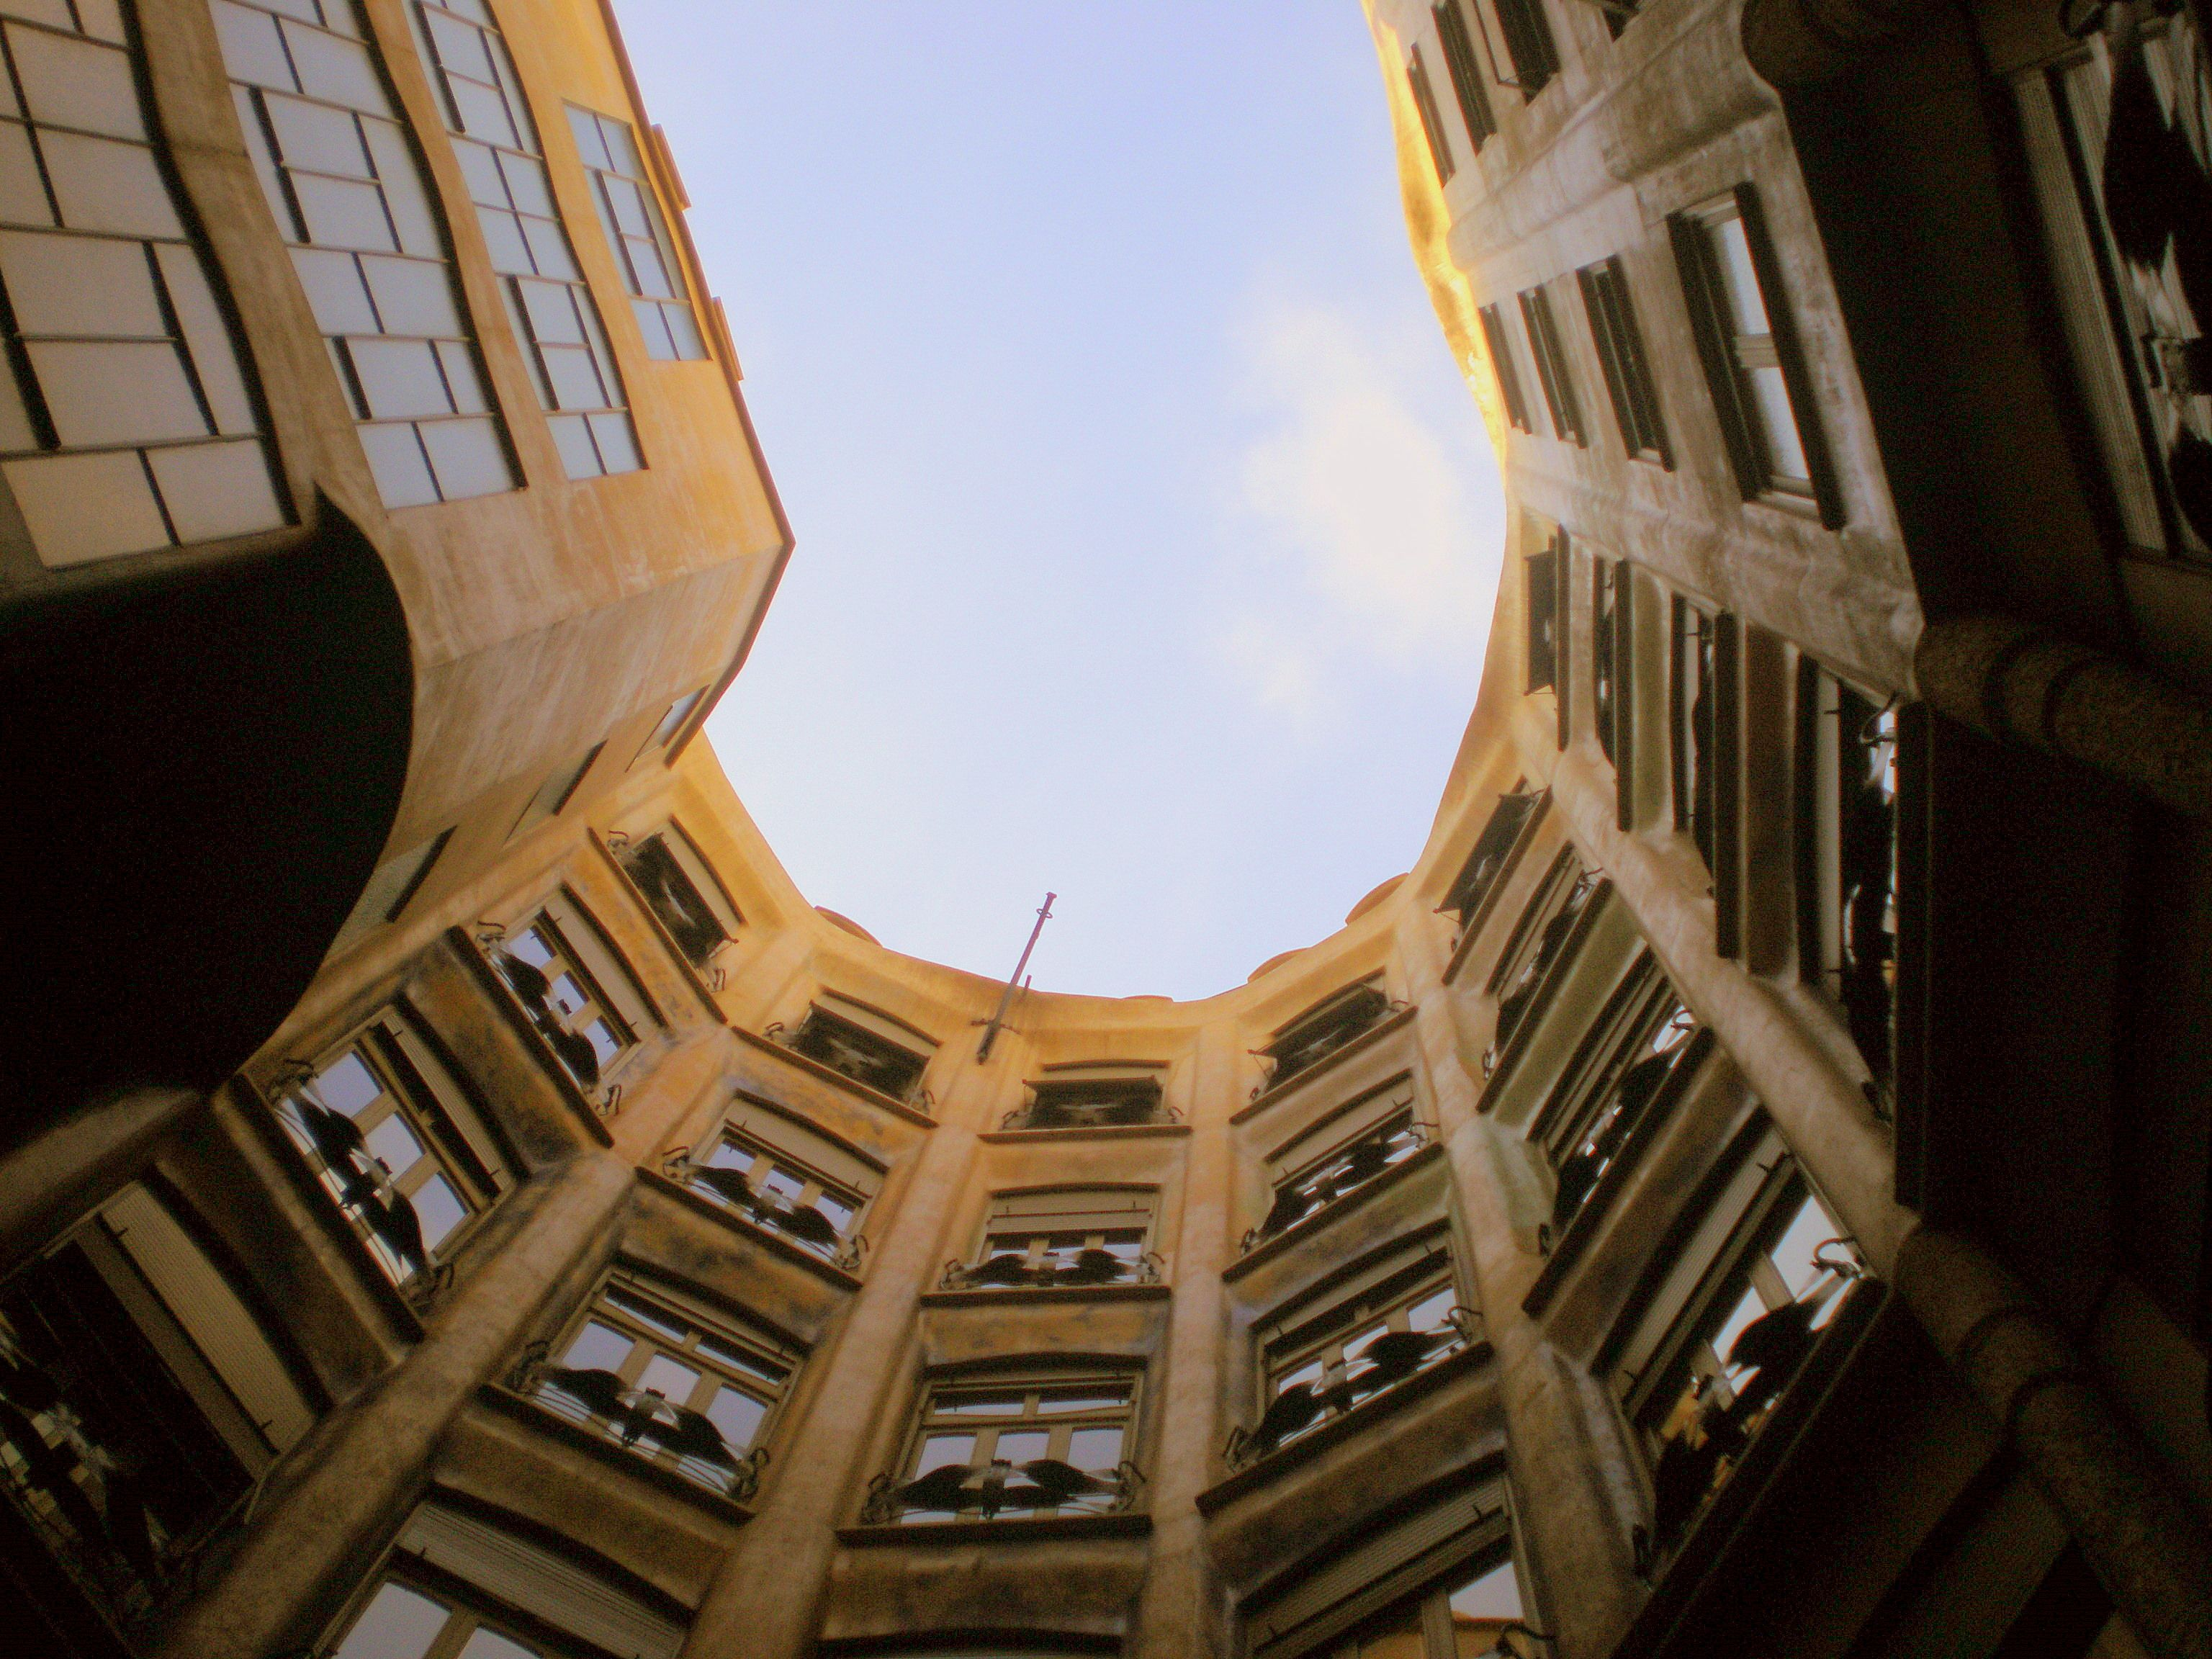 Casa Milá, completed in 1910, a private housing building also known as La Pedrera, a controversial building on Passeig de Gràcia, Barcelona.by Antoni Gaudi